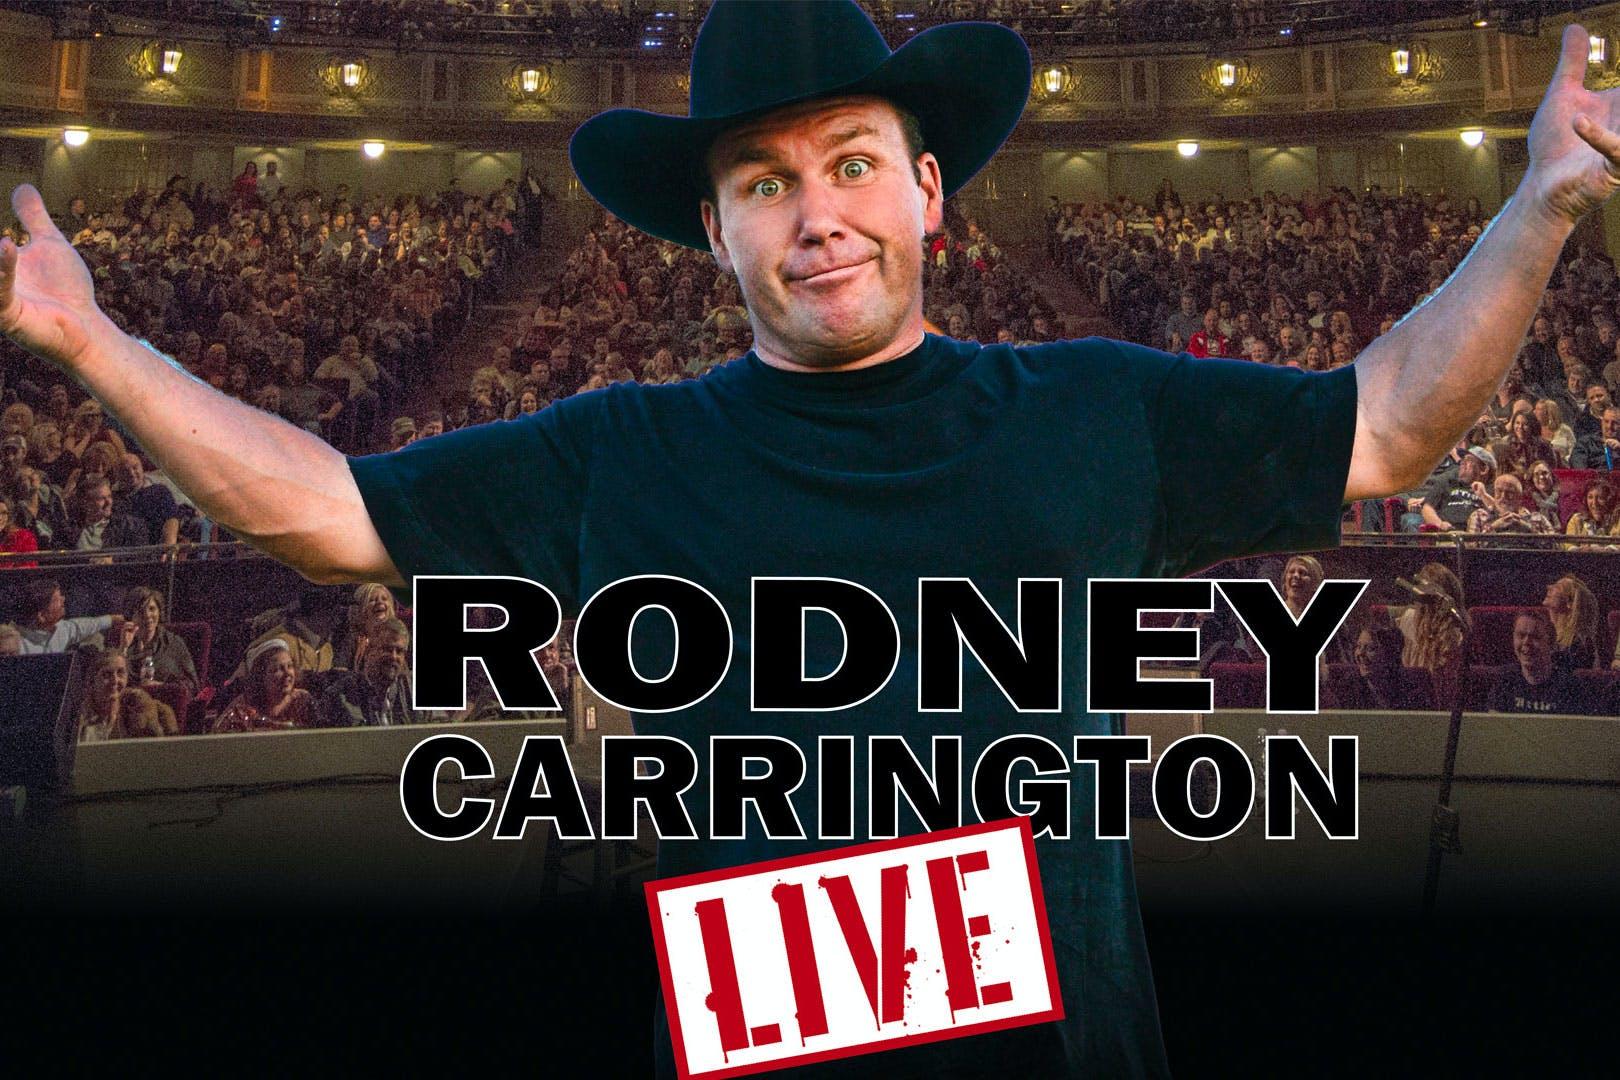 rodney-carrington-live-sugar-land-tx-july-2018